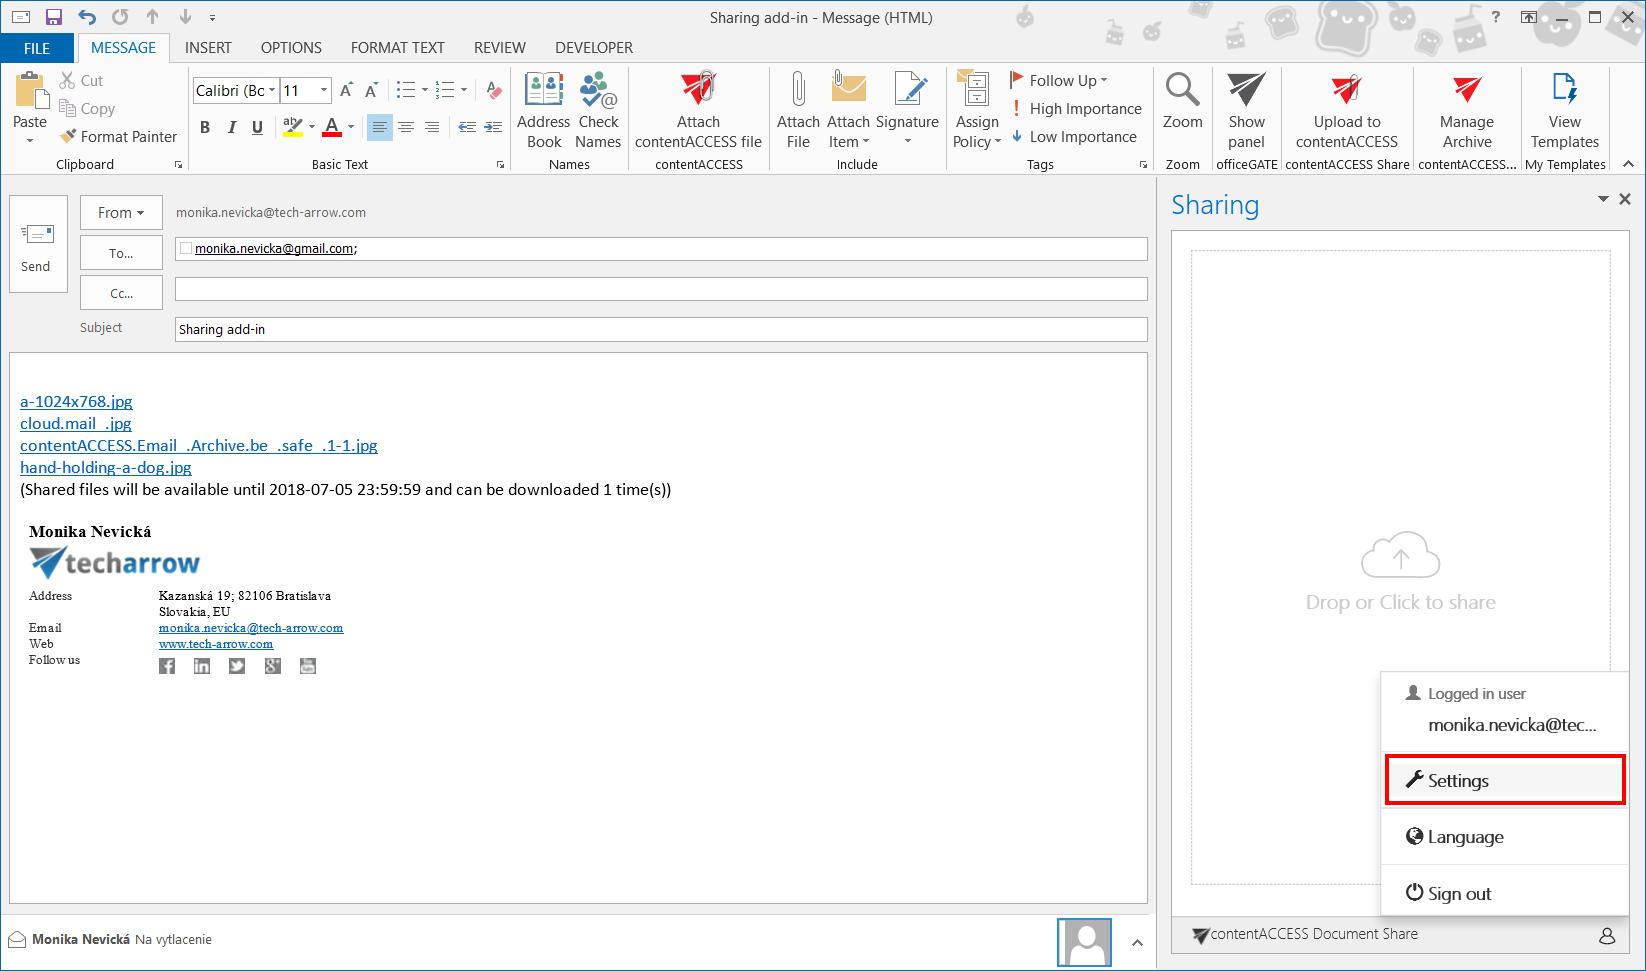 contentACCESS Sharing version 3 6 | TECH-ARROW Documentation Center